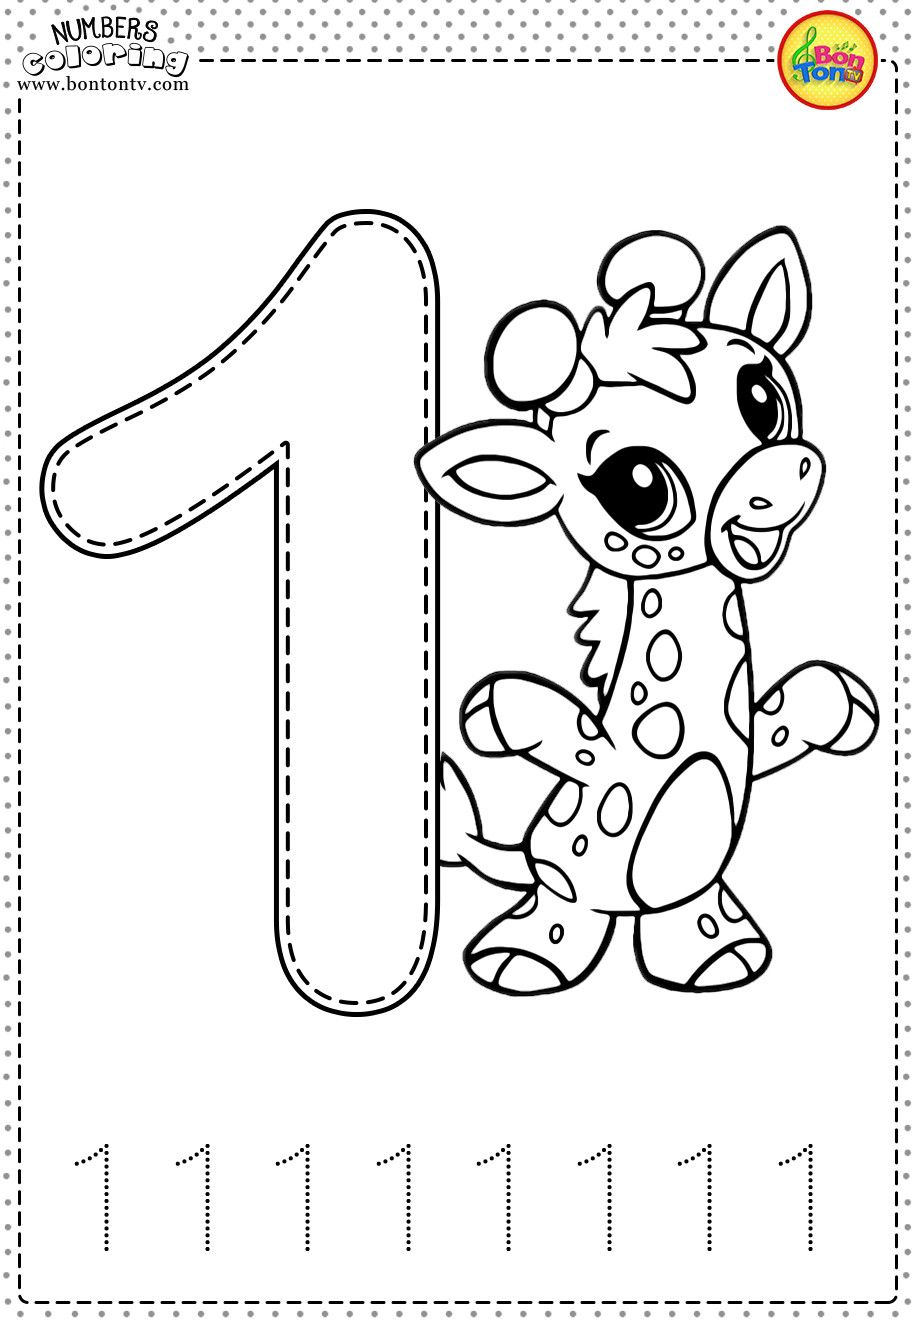 6 Number 2 Tracing Worksheets For Kids Em 2020 Atividade Alfabeto Educacao Infantil Alfabetizacao Na Educacao Infantil Tarefas Para Educacao Infantil